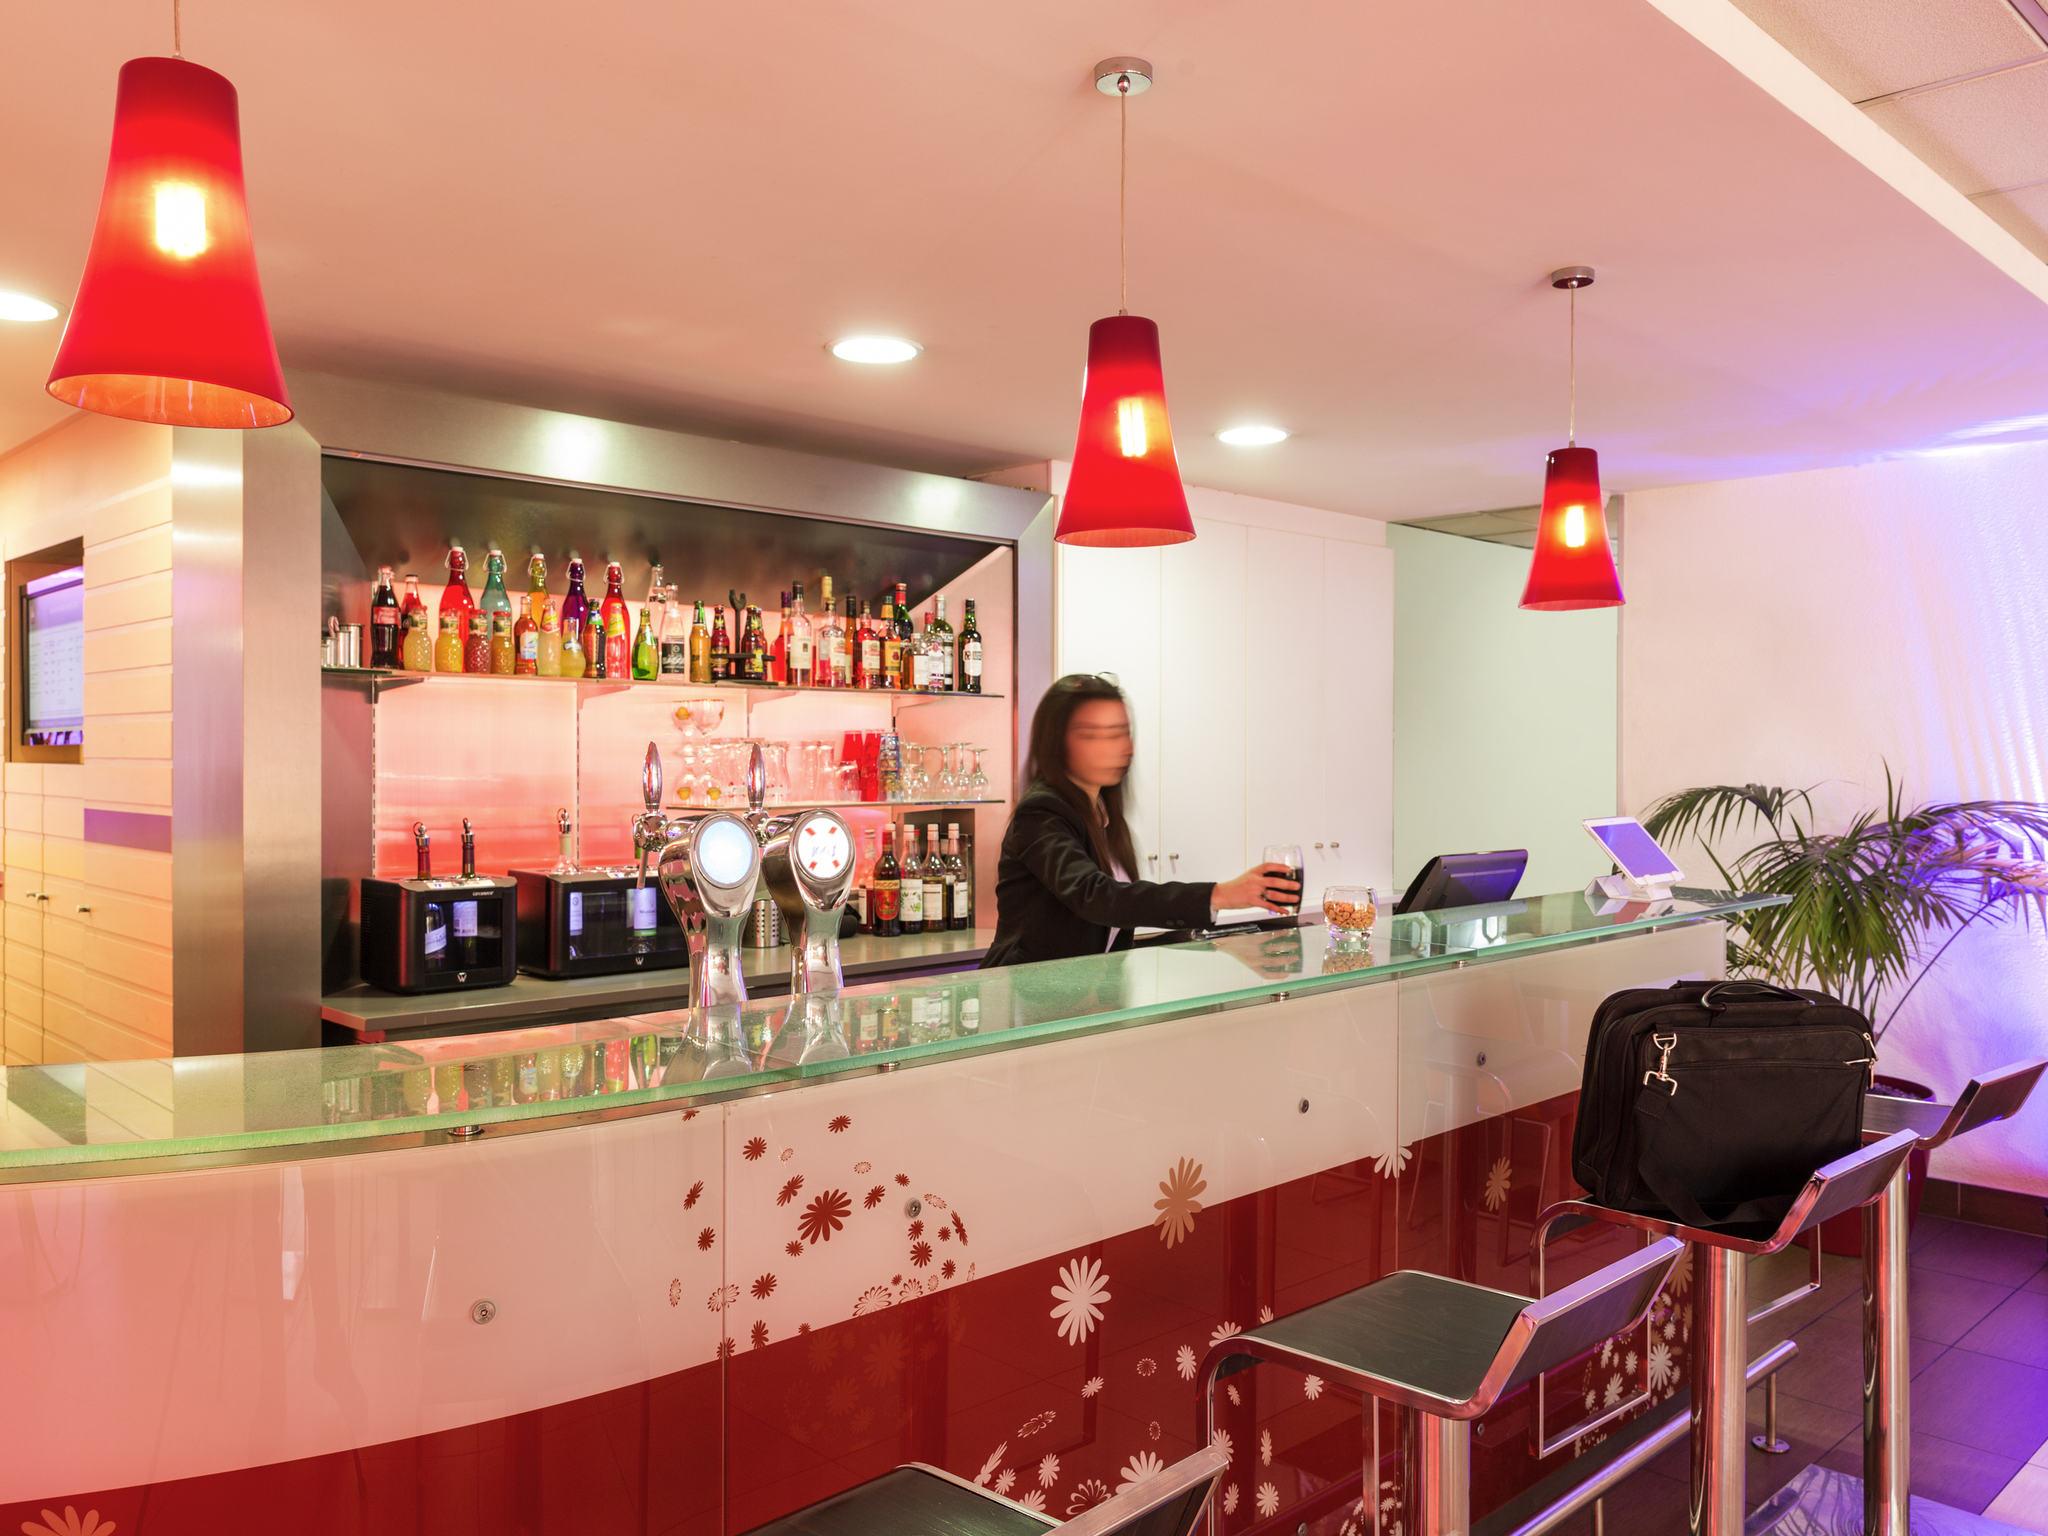 Ibis Hotel Aulnay Sous Bois